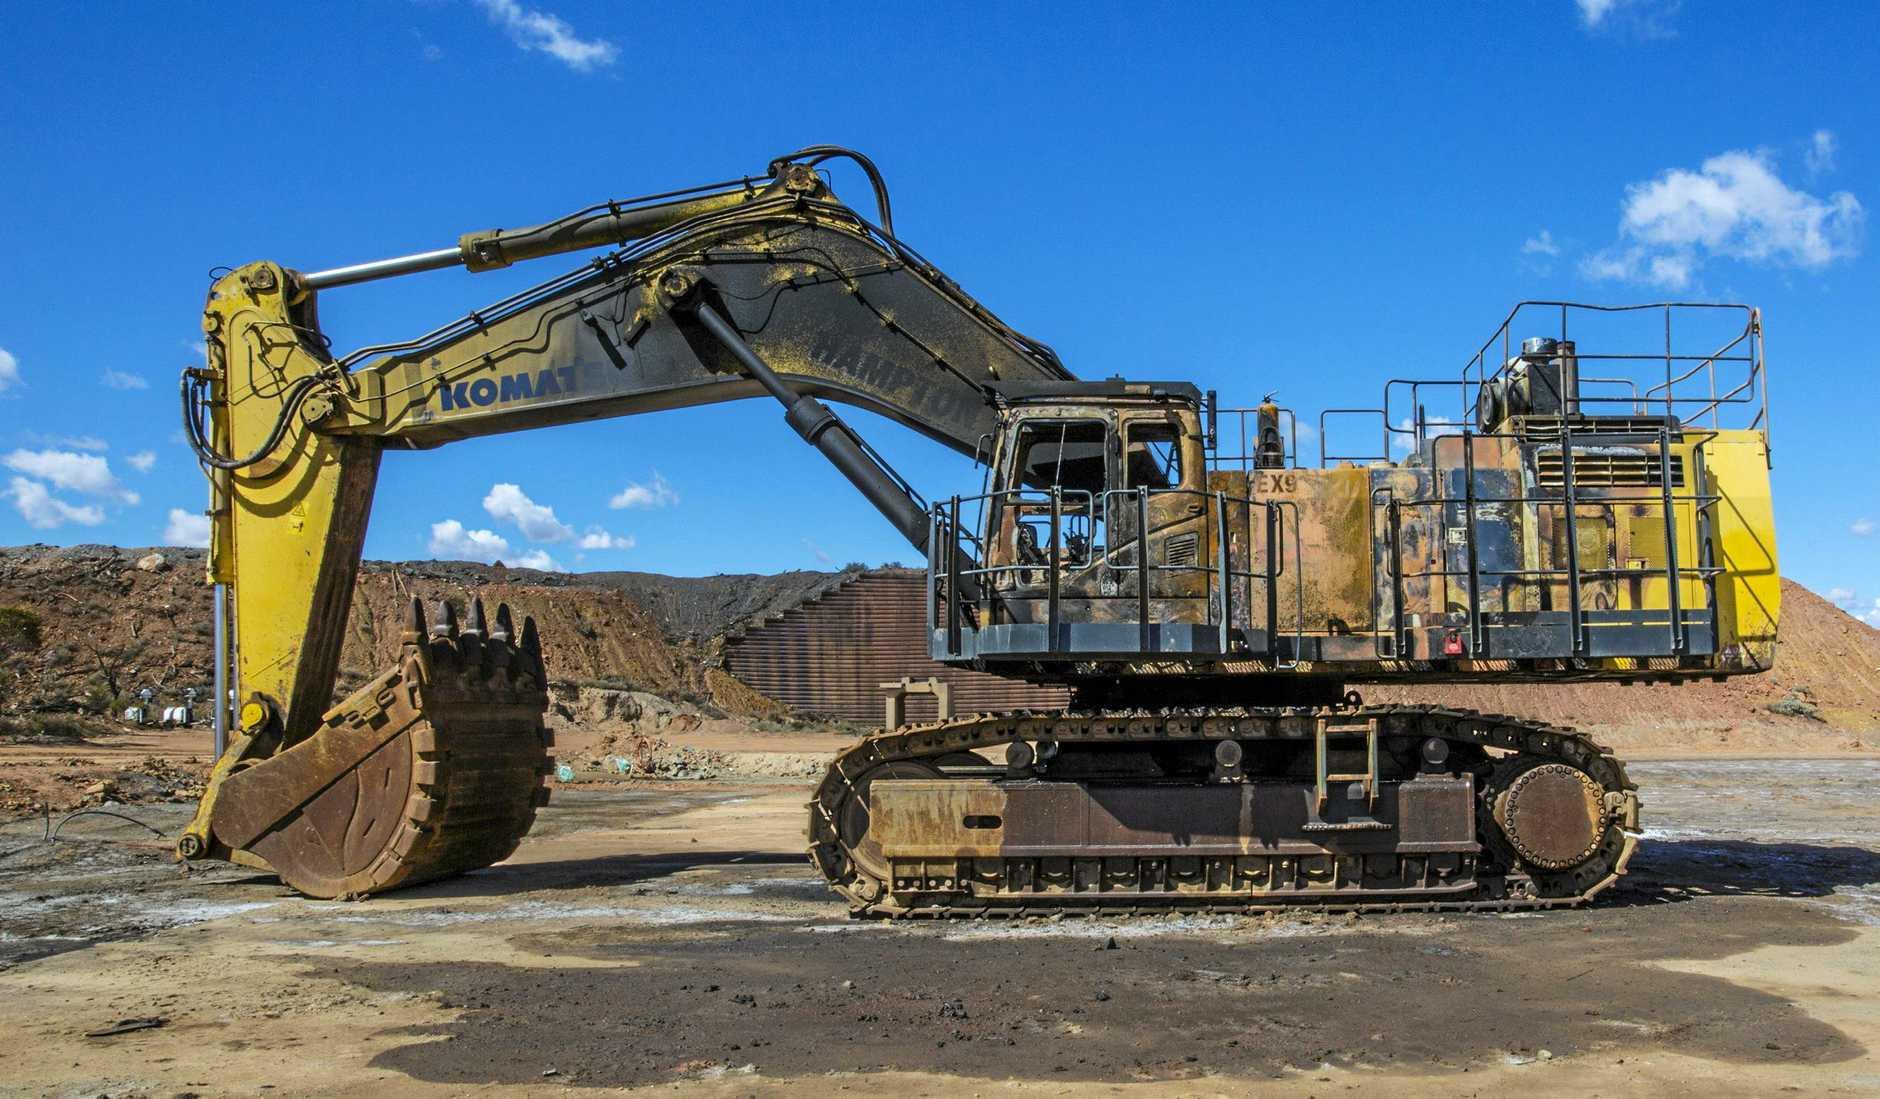 2008 Komatsu PC1250-8R excavator.